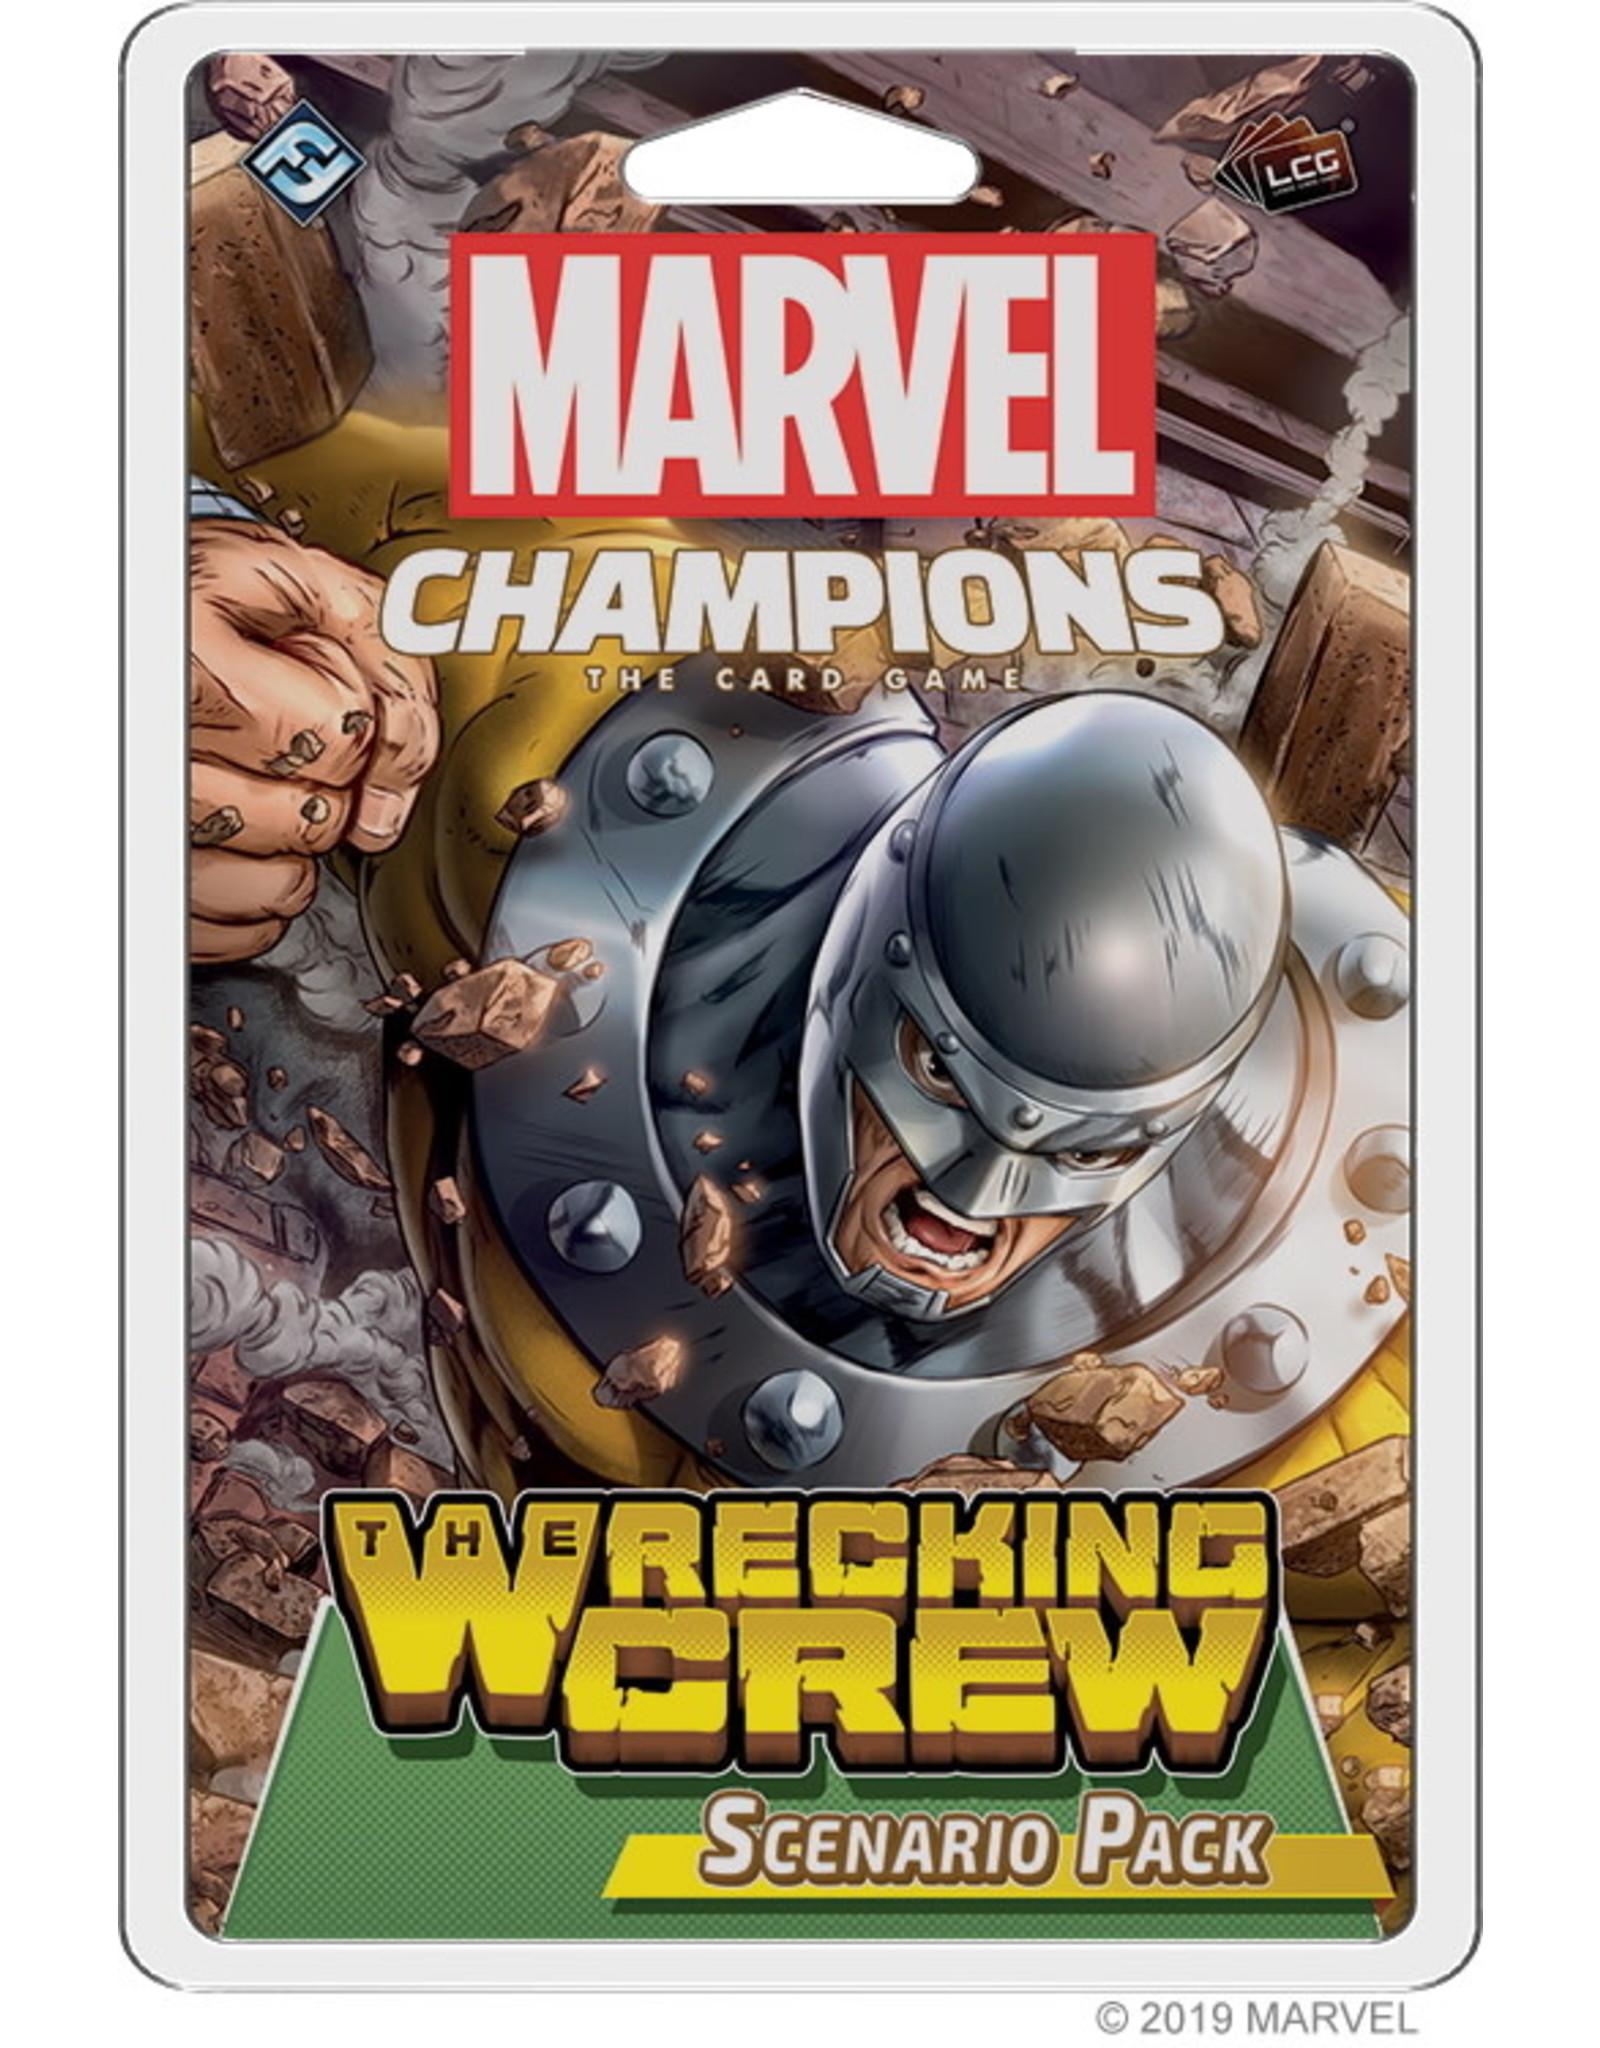 Marvel Champions Scenario Pack The Wrecking Crew